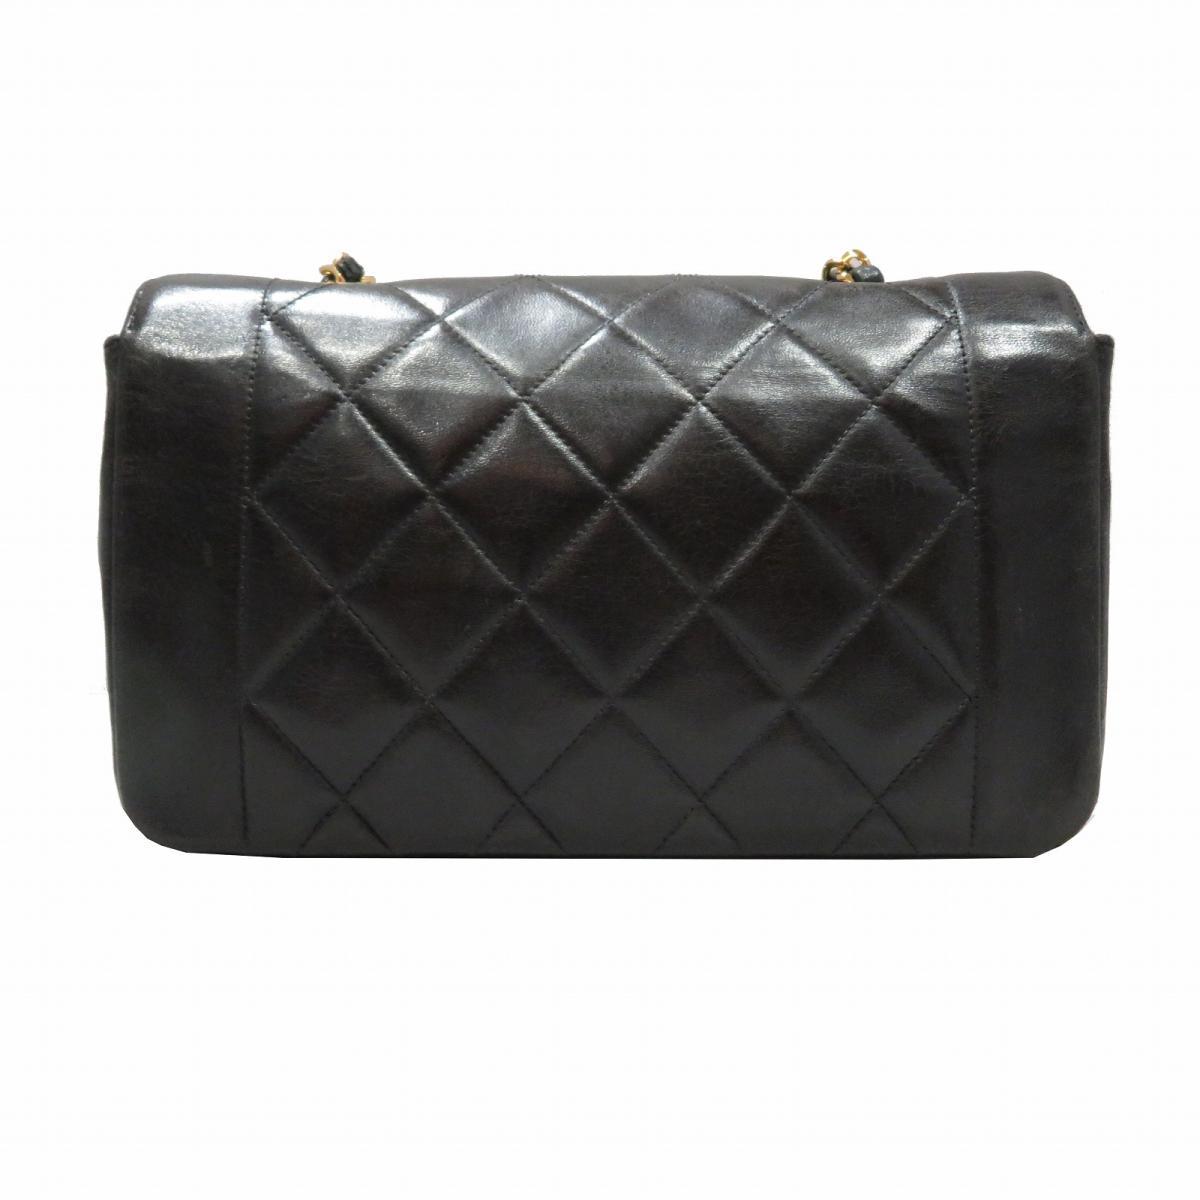 e22553cc620cae BRANDOFF: Auth CHANEL Matelasse CC chain shoulder bag Sheep leather (lamb)  Black Used Vintage | BRANDOFF Ginza/TOKYO/Japan | Rakuten Global Market